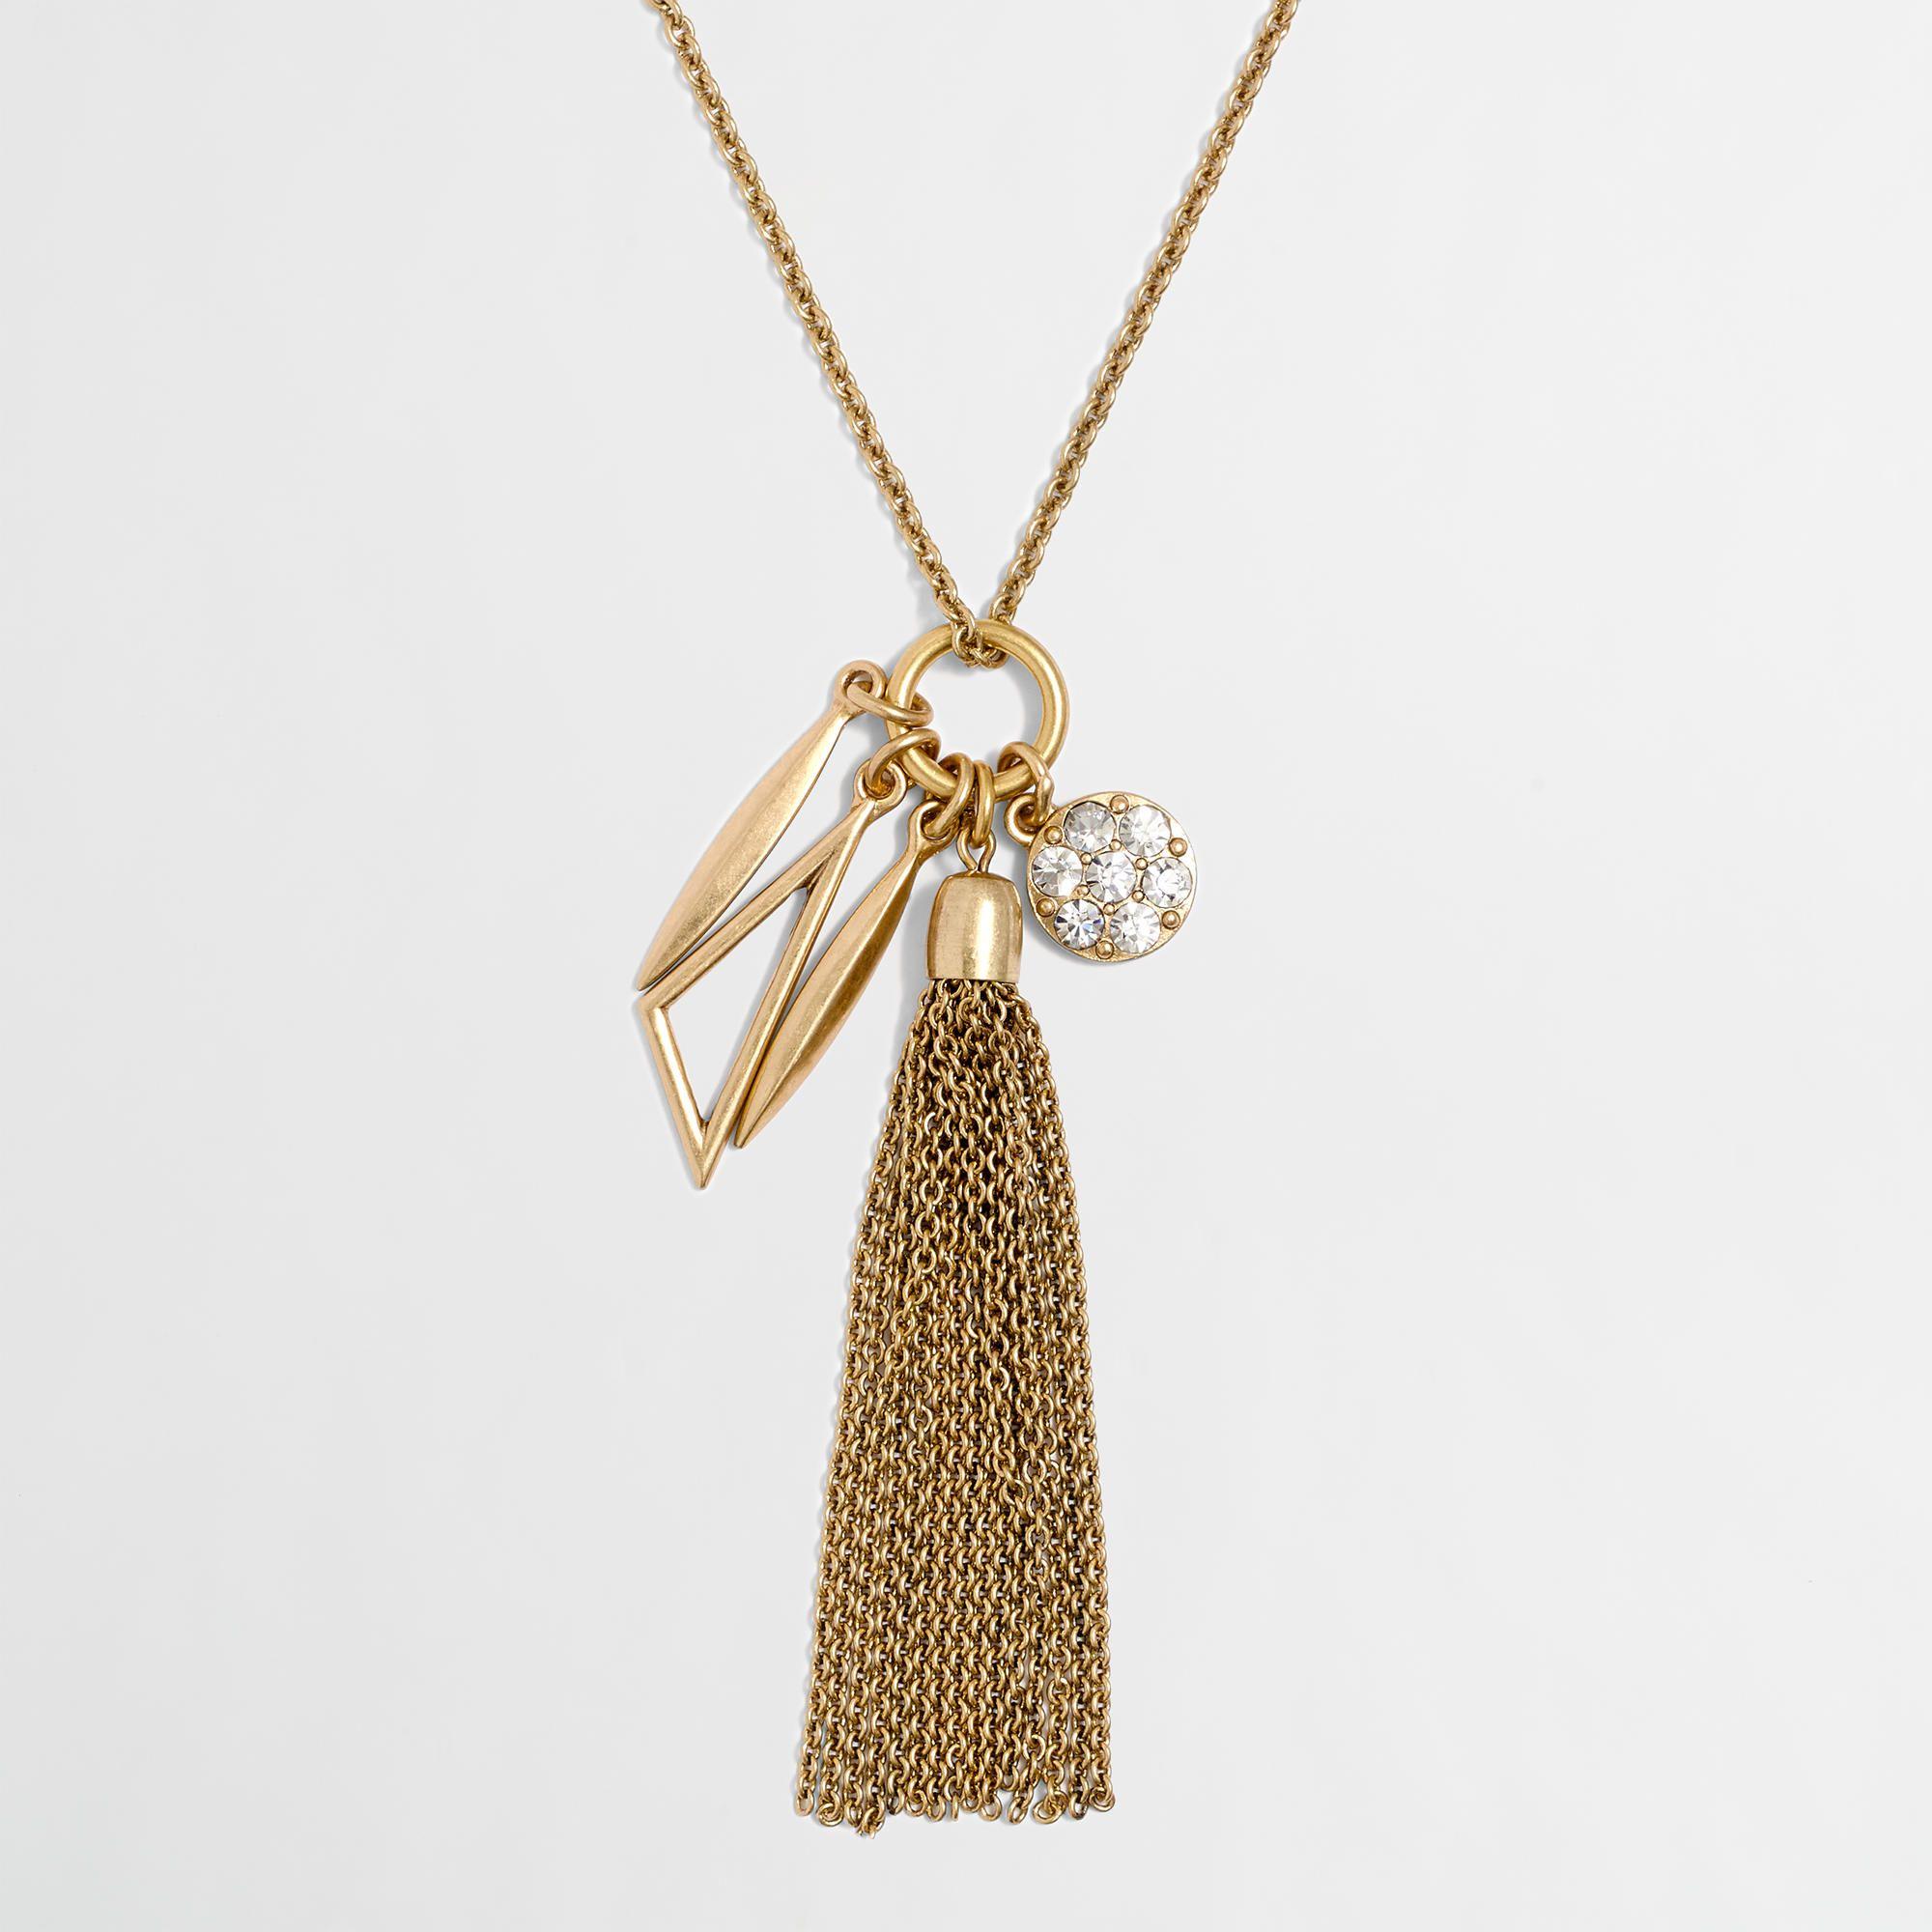 1a2227fb600c56 Factory tassel charms pendant necklace : Necklaces   J.Crew Factory ...